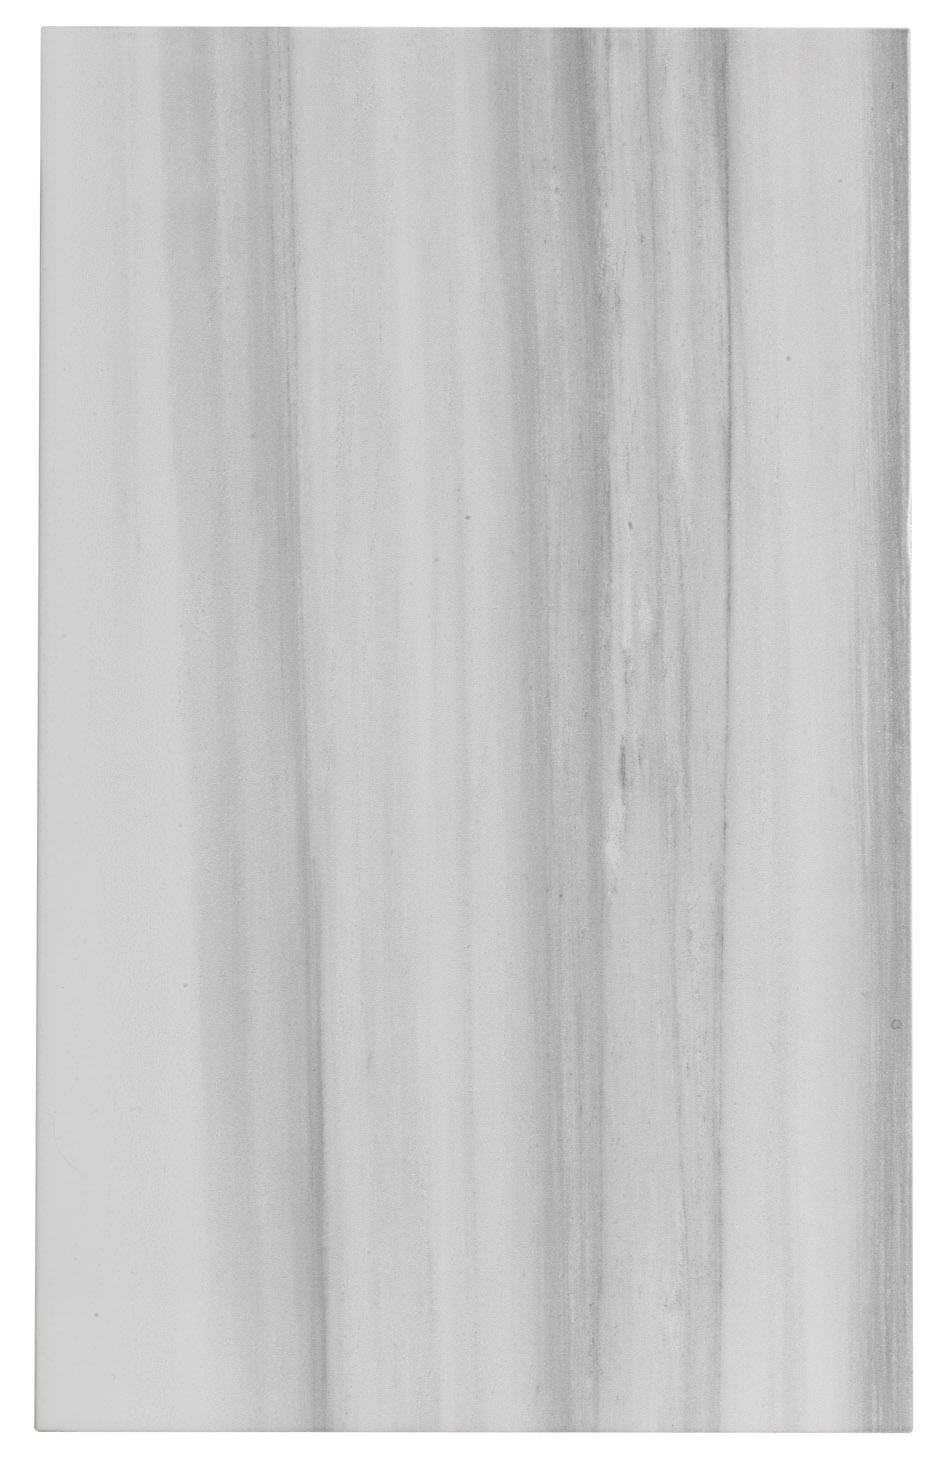 "Horizon Grey Wall Ceramic Tile - 10"" x 16"" Image"